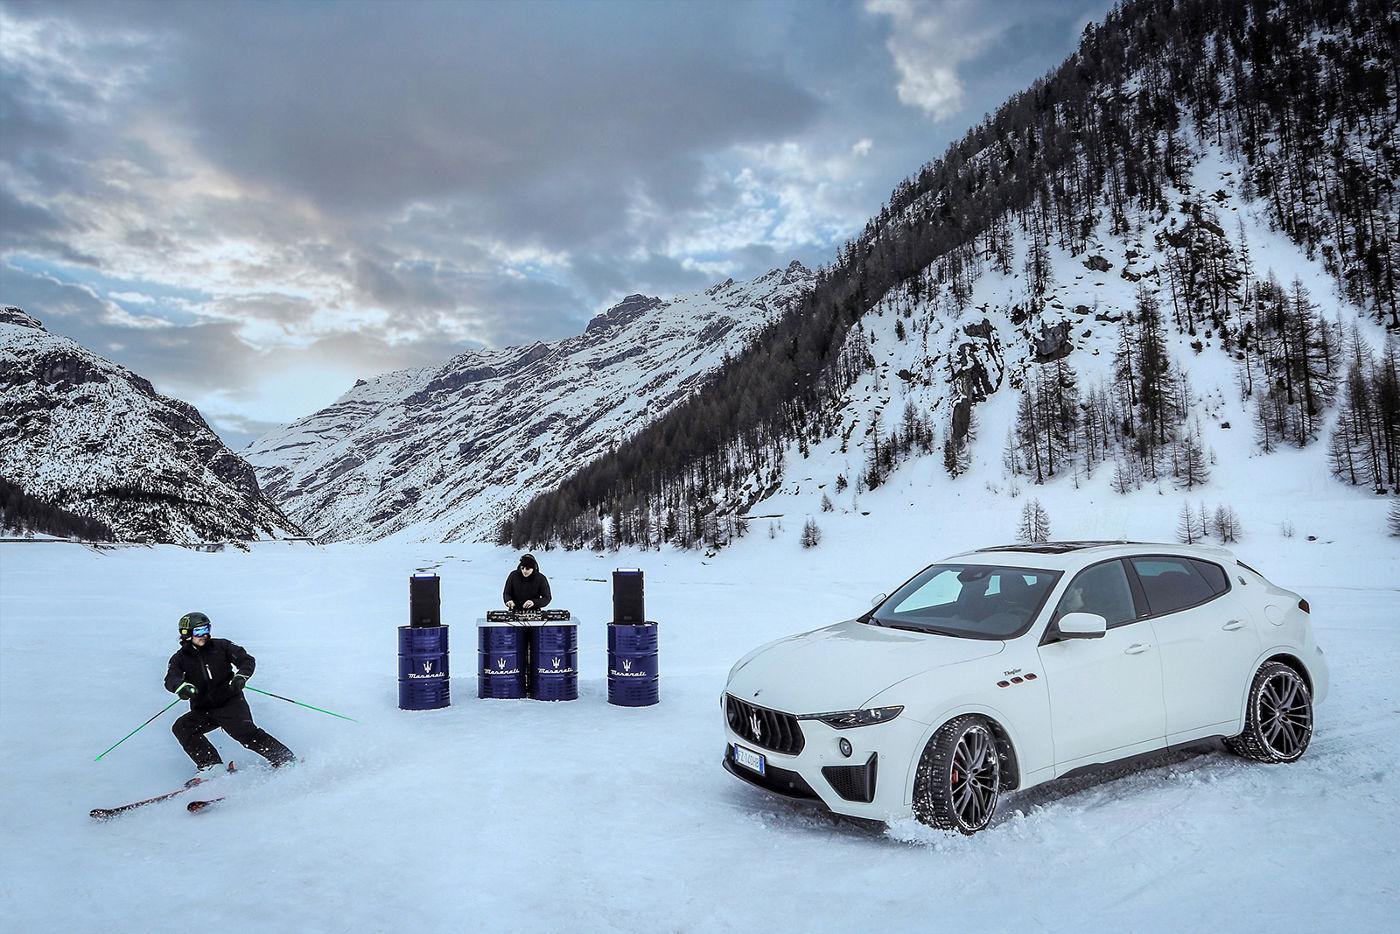 Giorgio Rocca im Maserati Levante auf dem Rückweg - DJ und Skifahrer